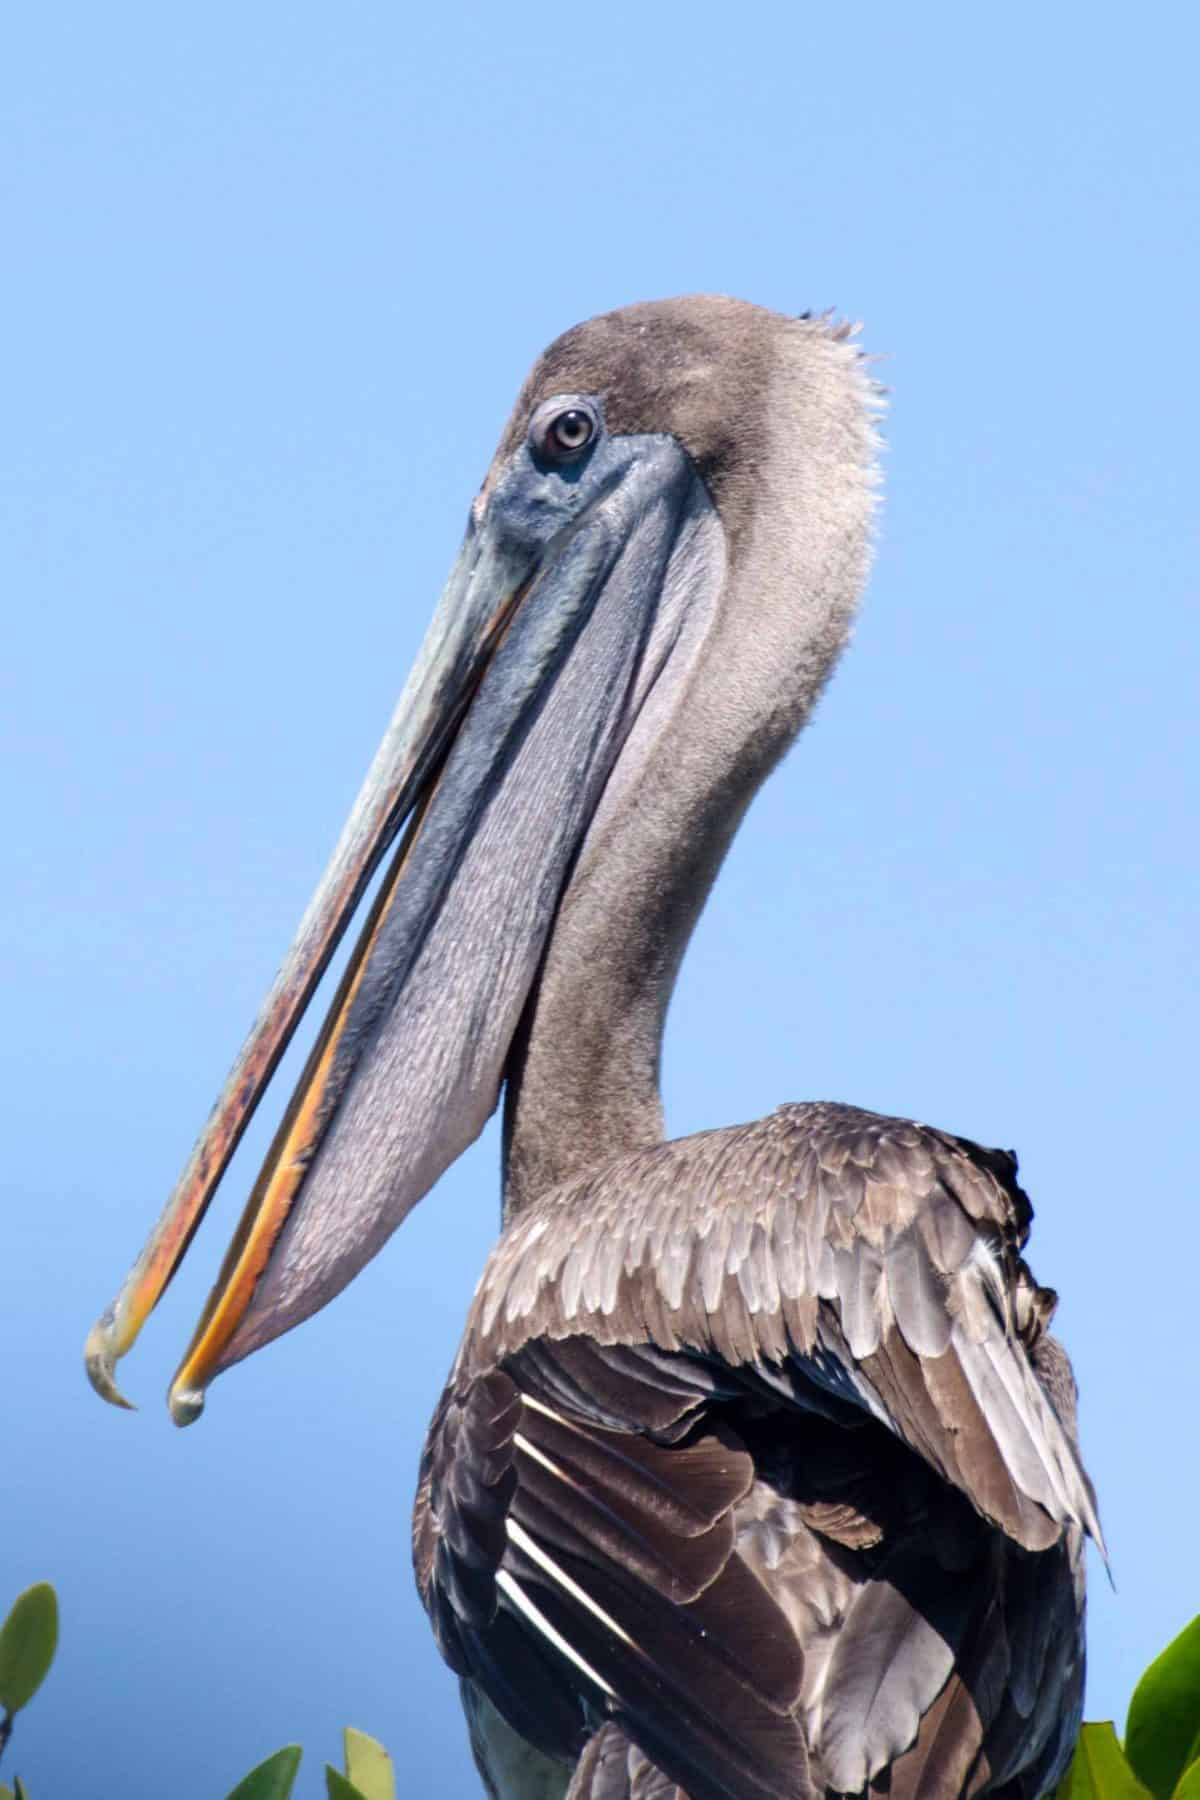 Brown Pelican, Isabela Island, The Galapagos, Ecuador   ©Angela Drake / Not Your Average American